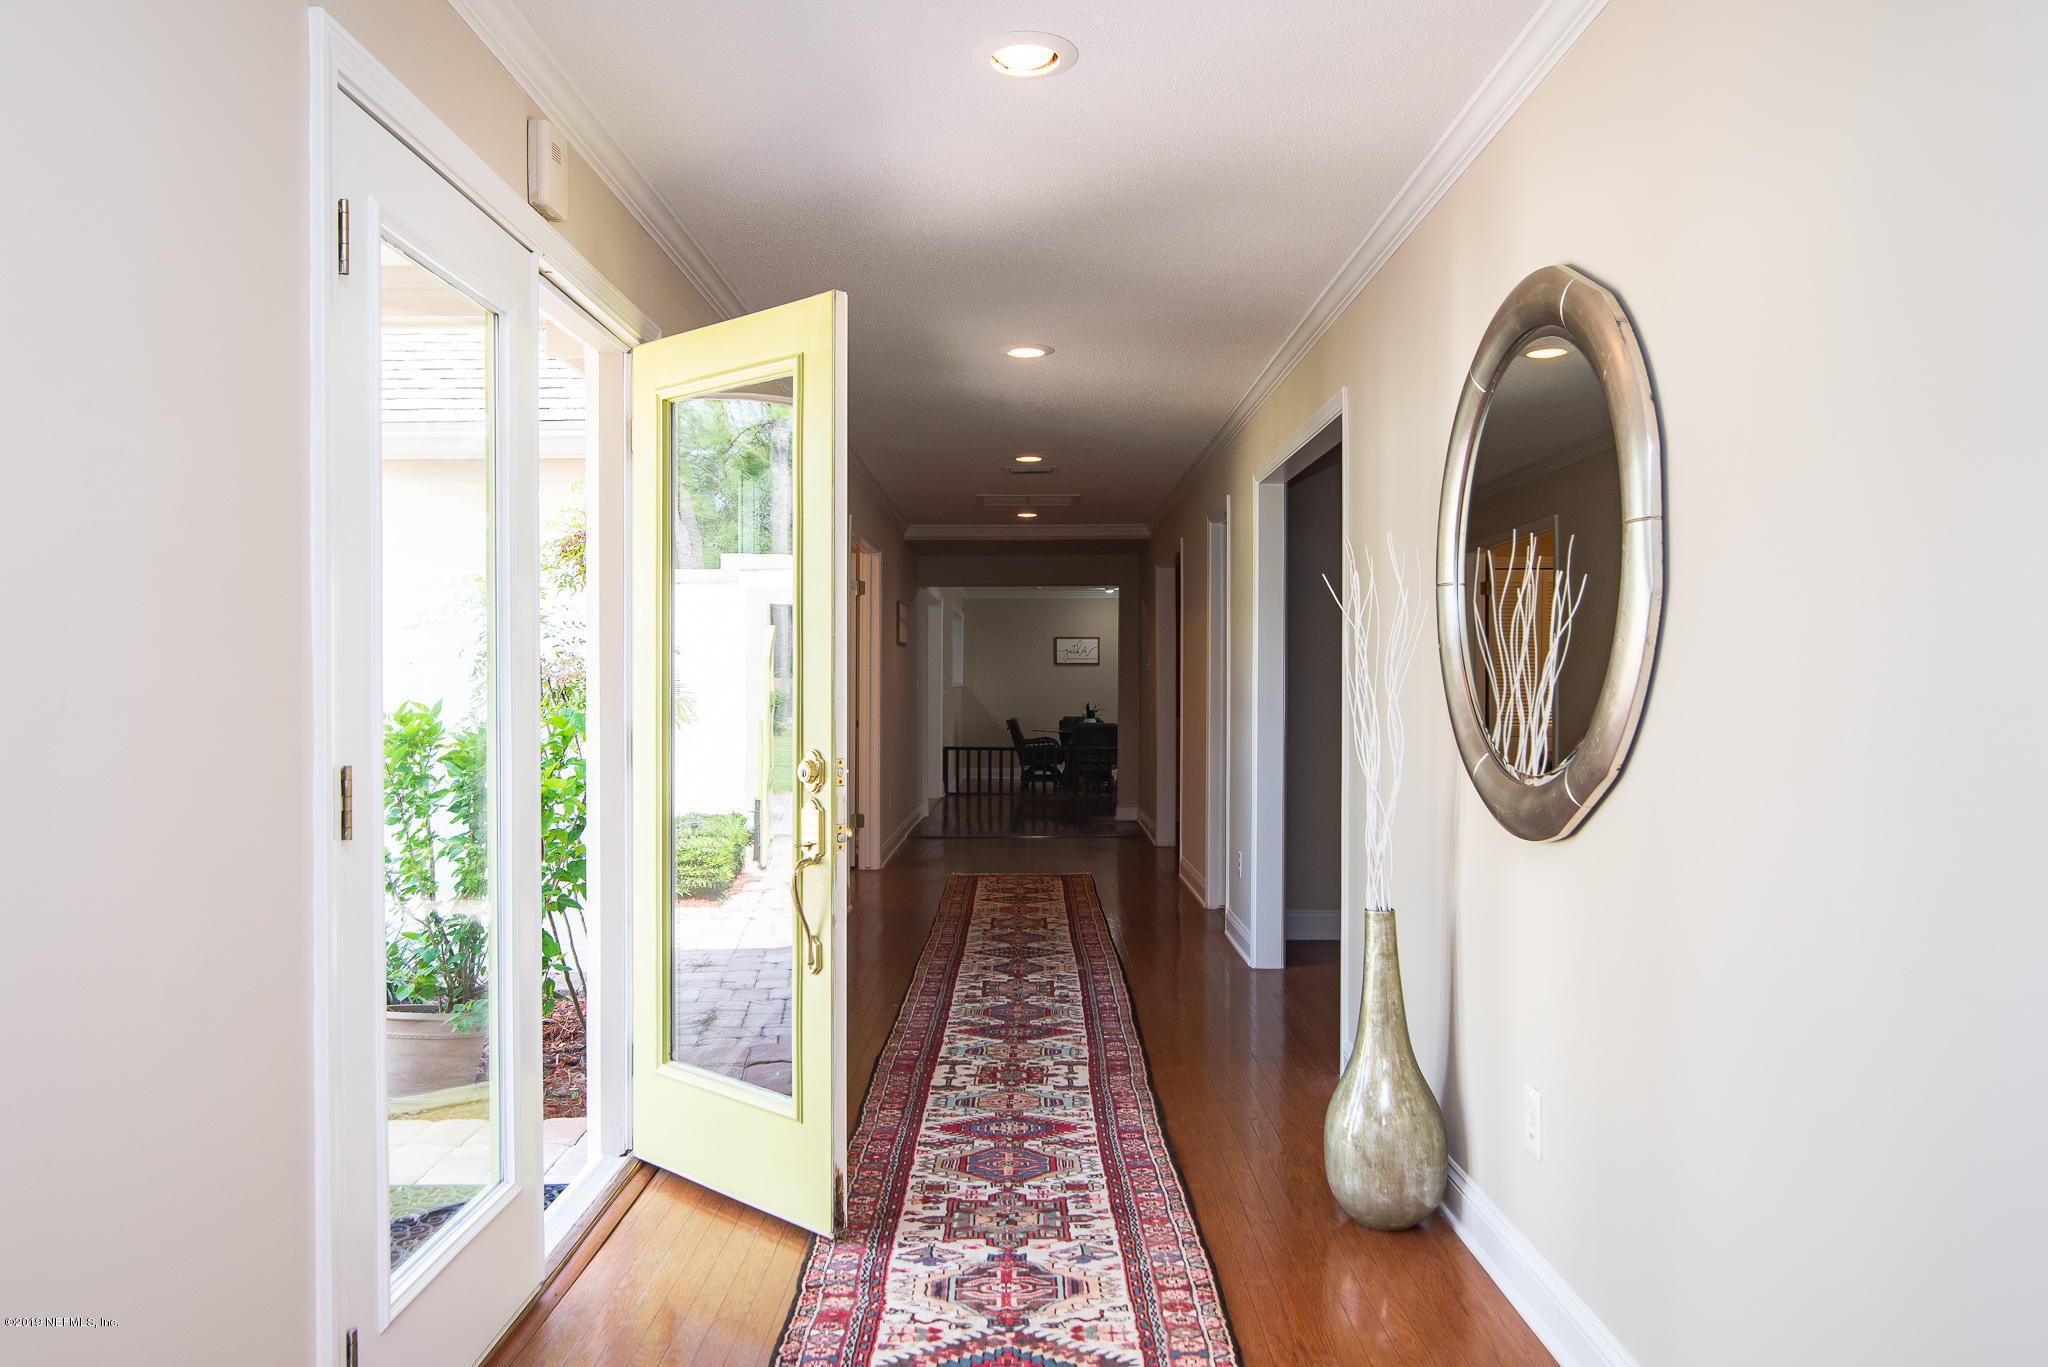 8166 HOLLYRIDGE, JACKSONVILLE, FLORIDA 32256, 5 Bedrooms Bedrooms, ,4 BathroomsBathrooms,Residential - single family,For sale,HOLLYRIDGE,1014292